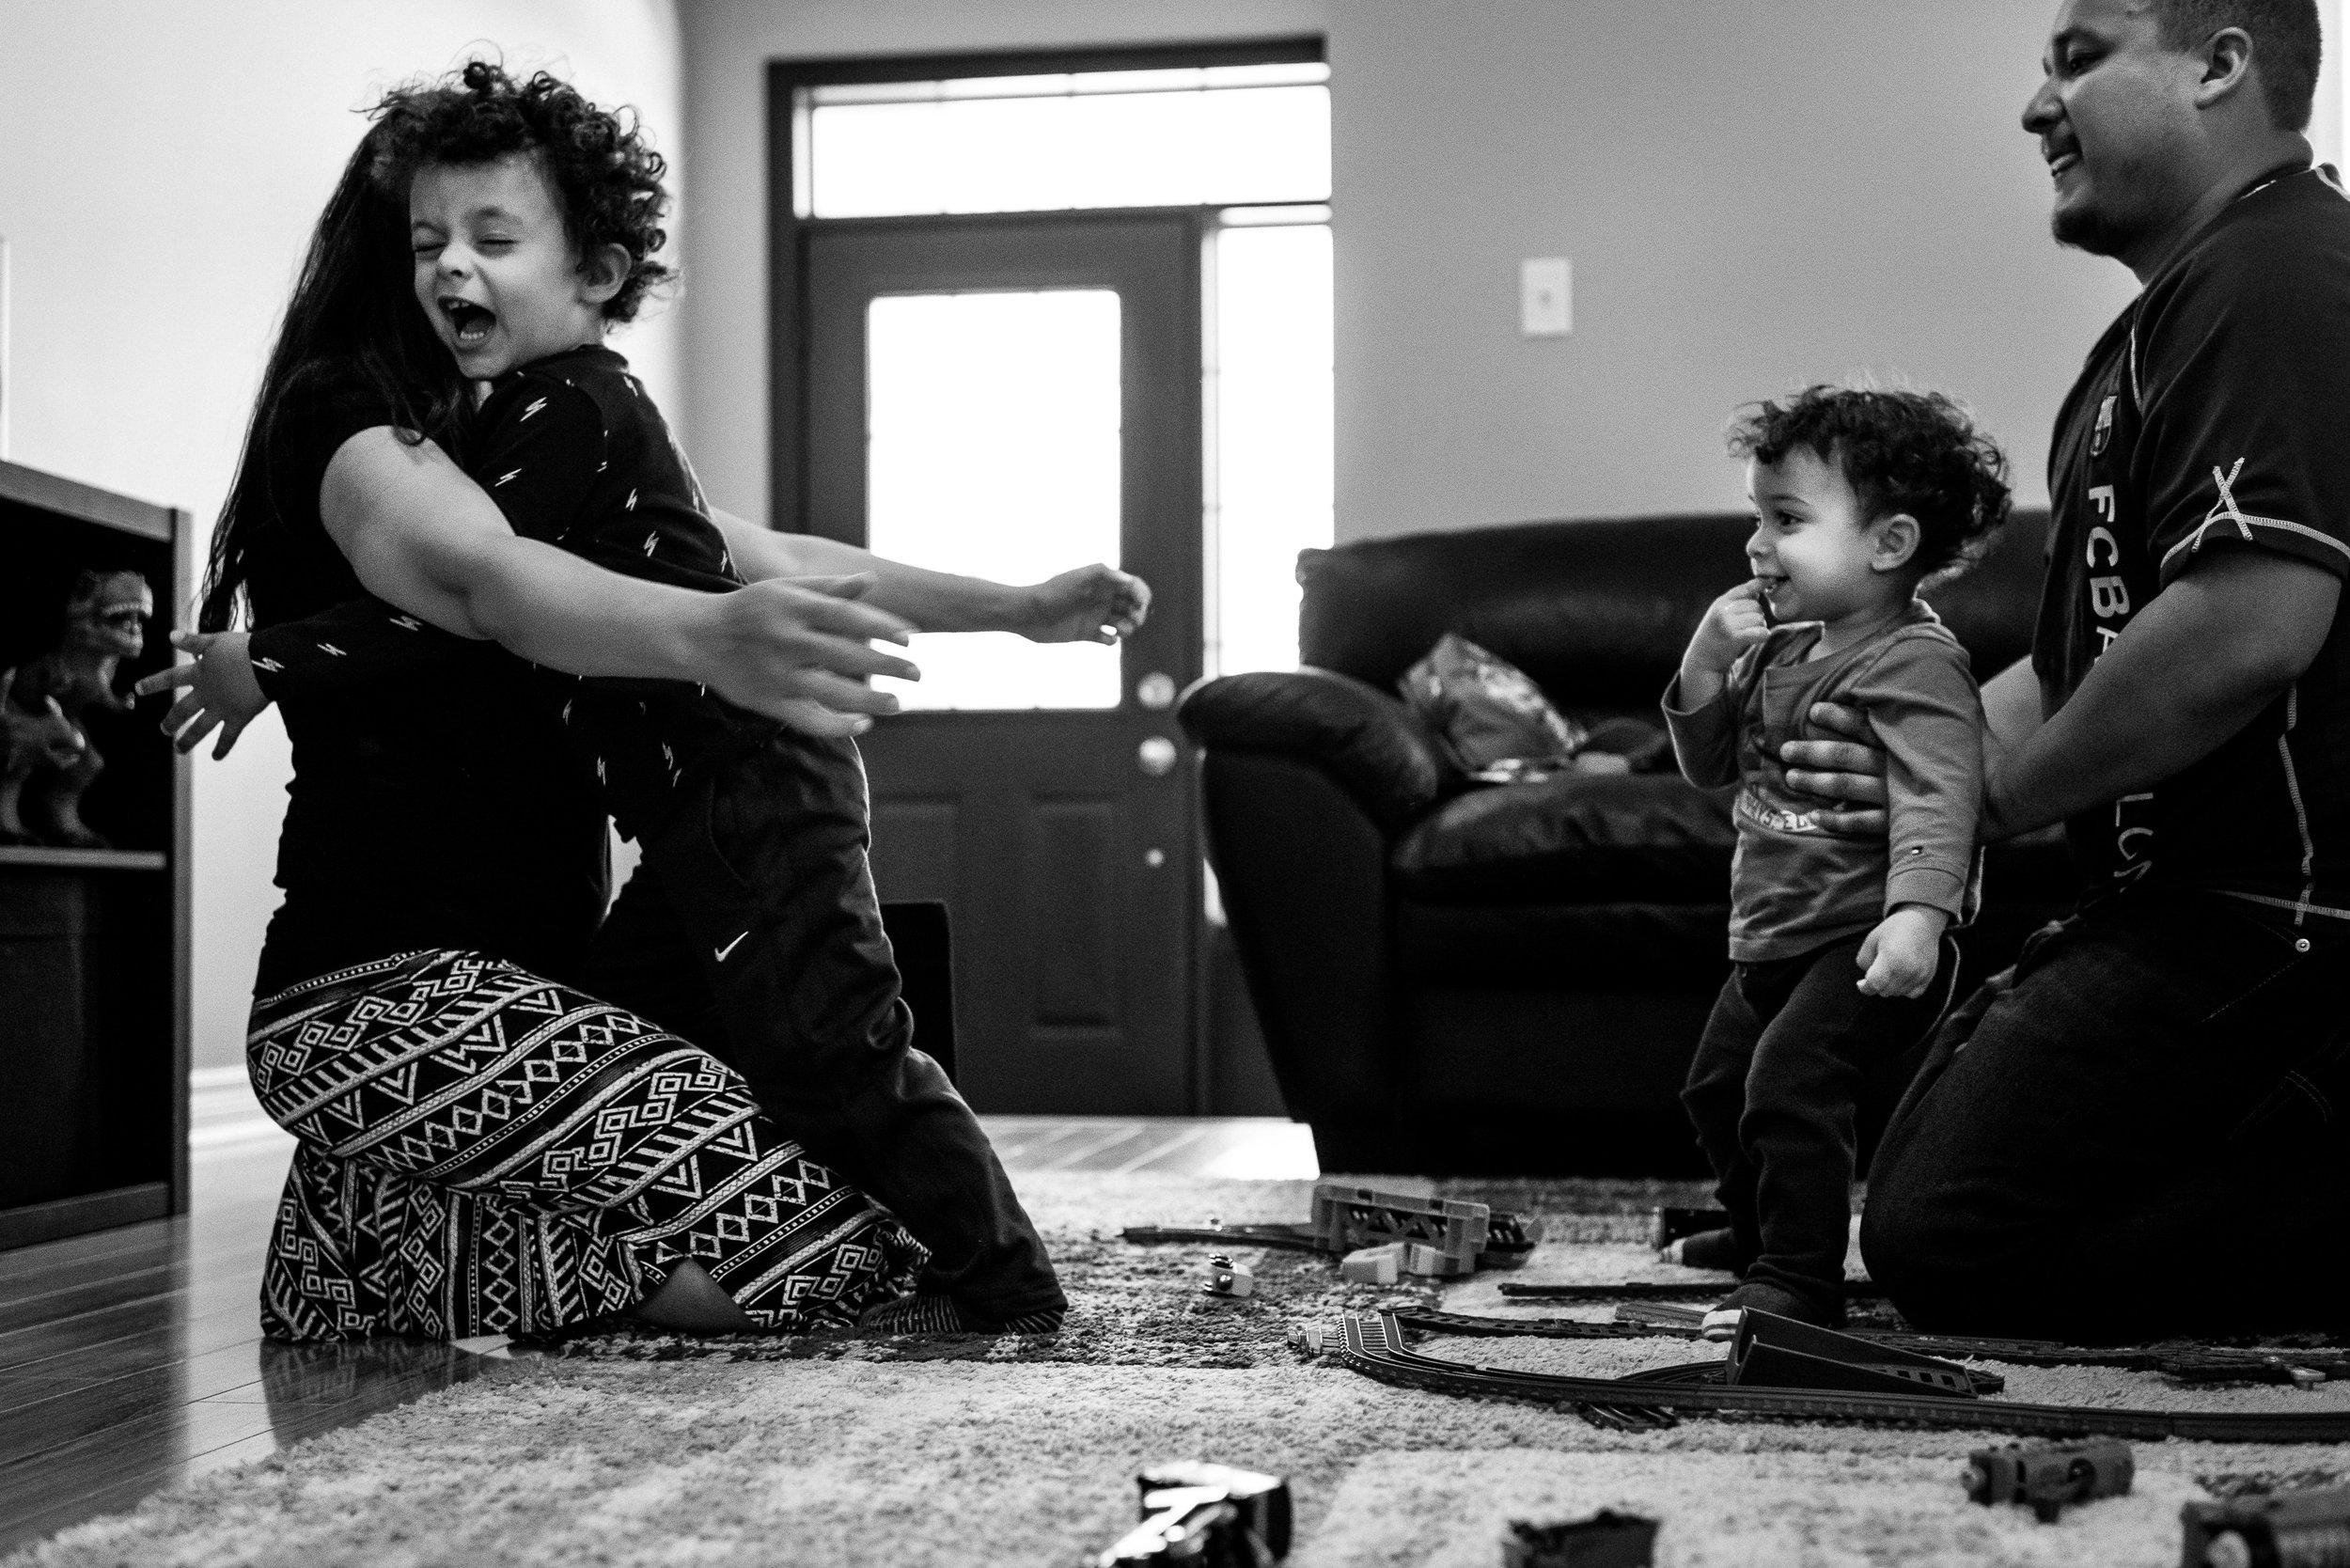 family documentary photography brampton -120457vm.jpg